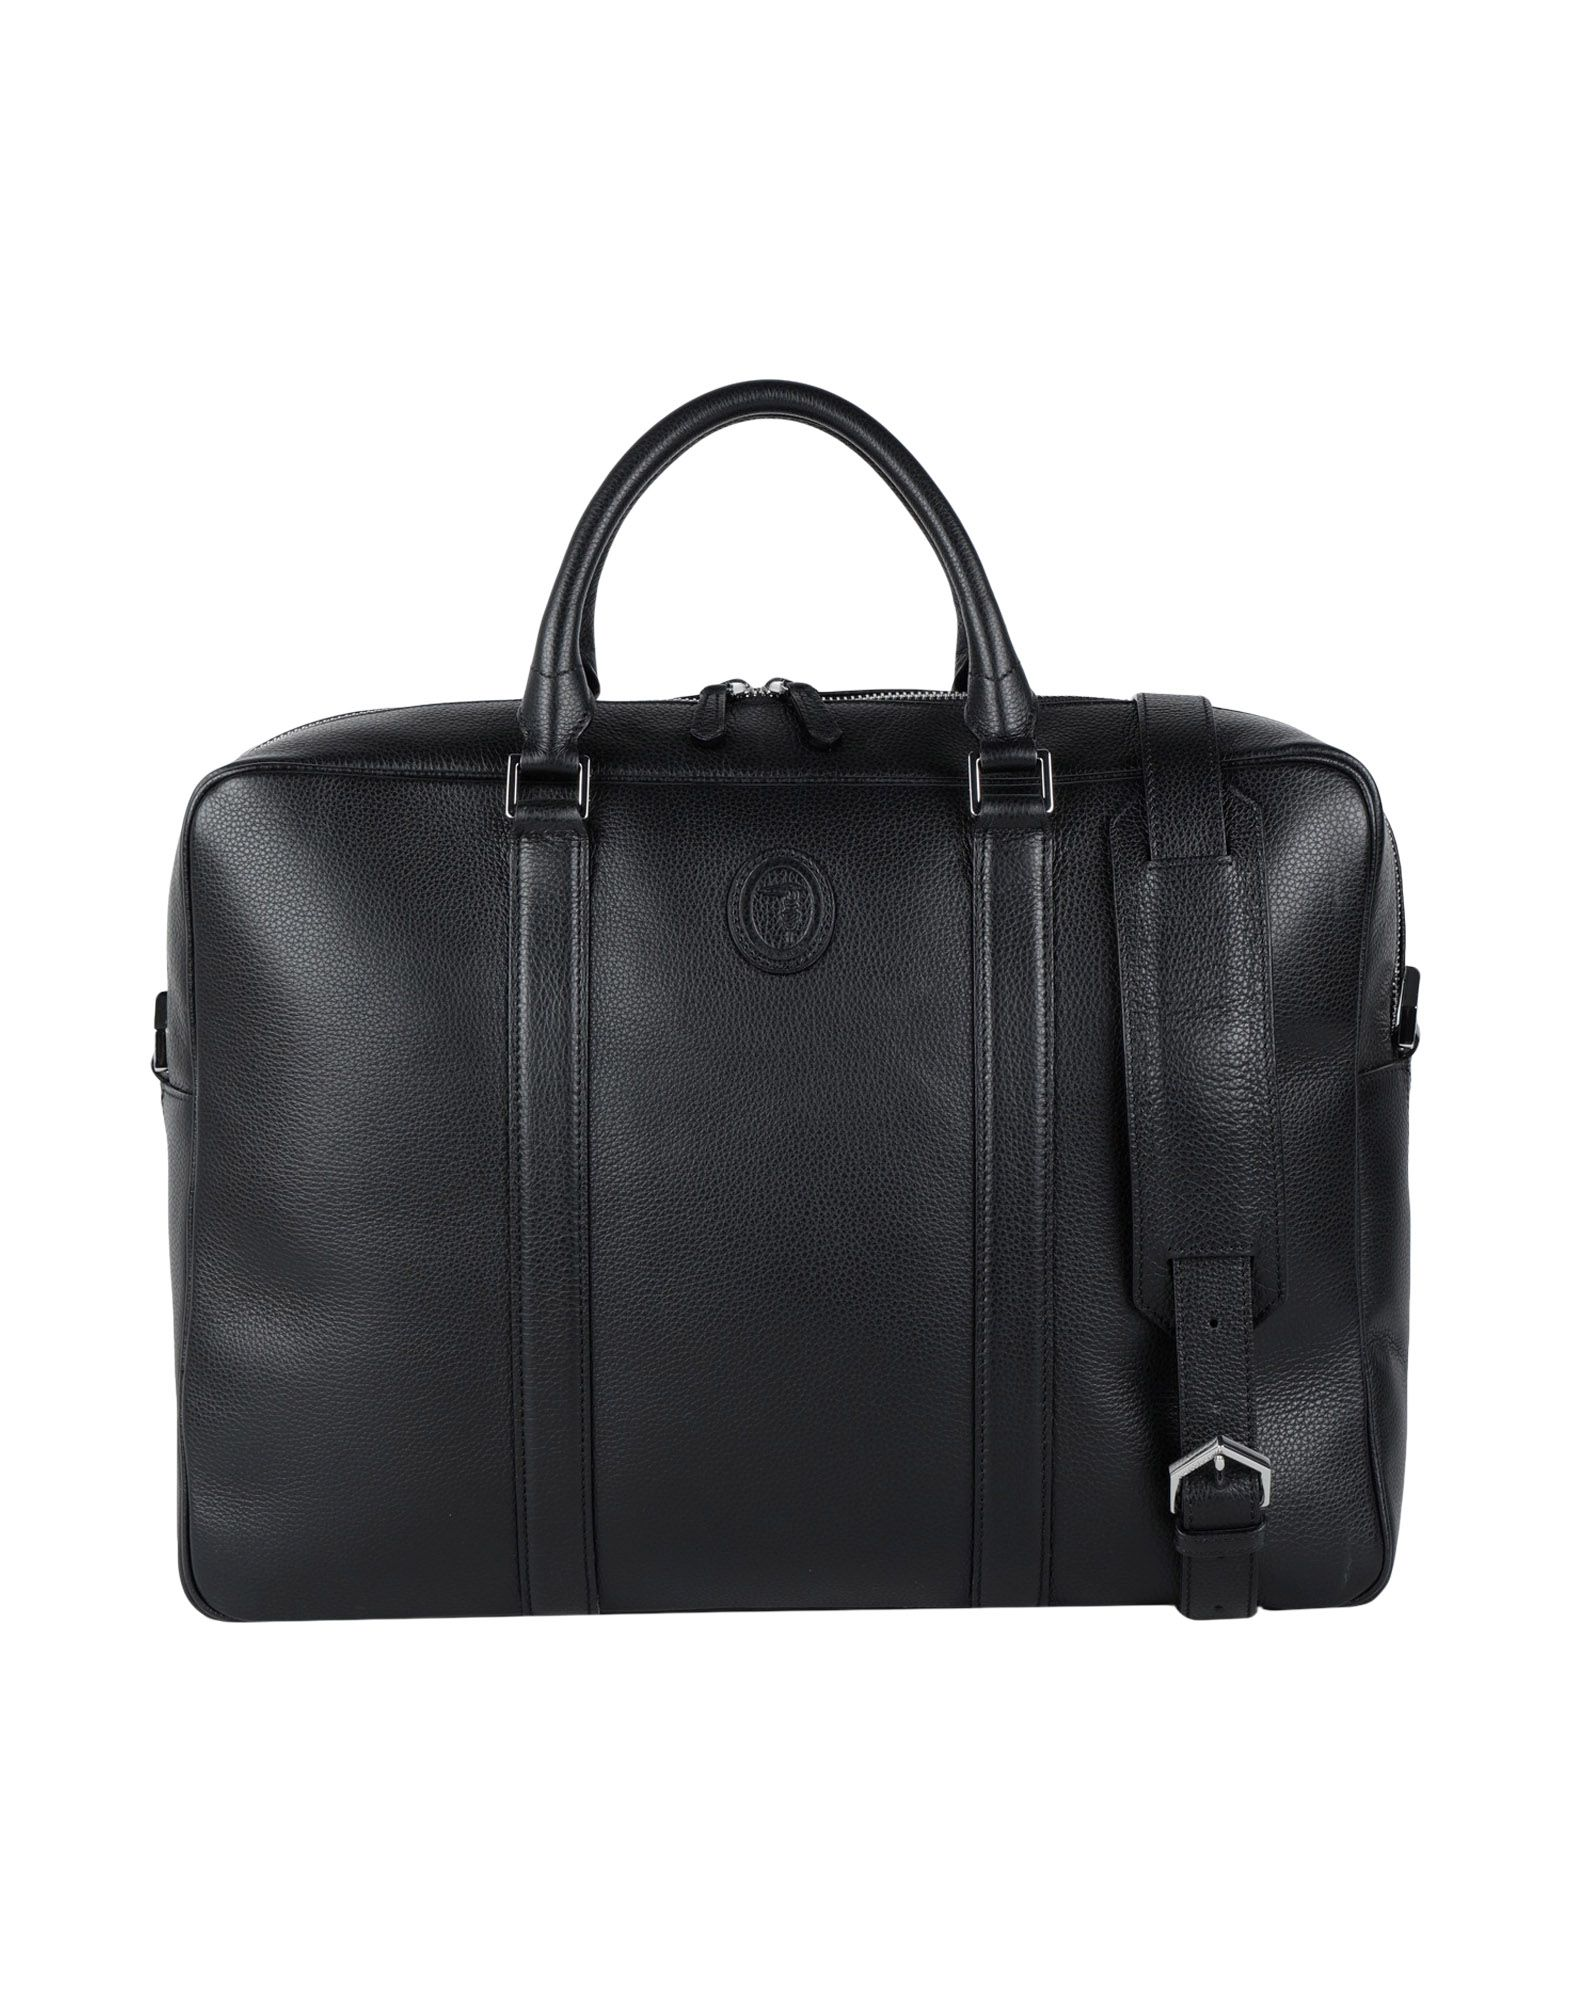 TRUSSARDI Деловые сумки bag trussardi collection сумки деловые